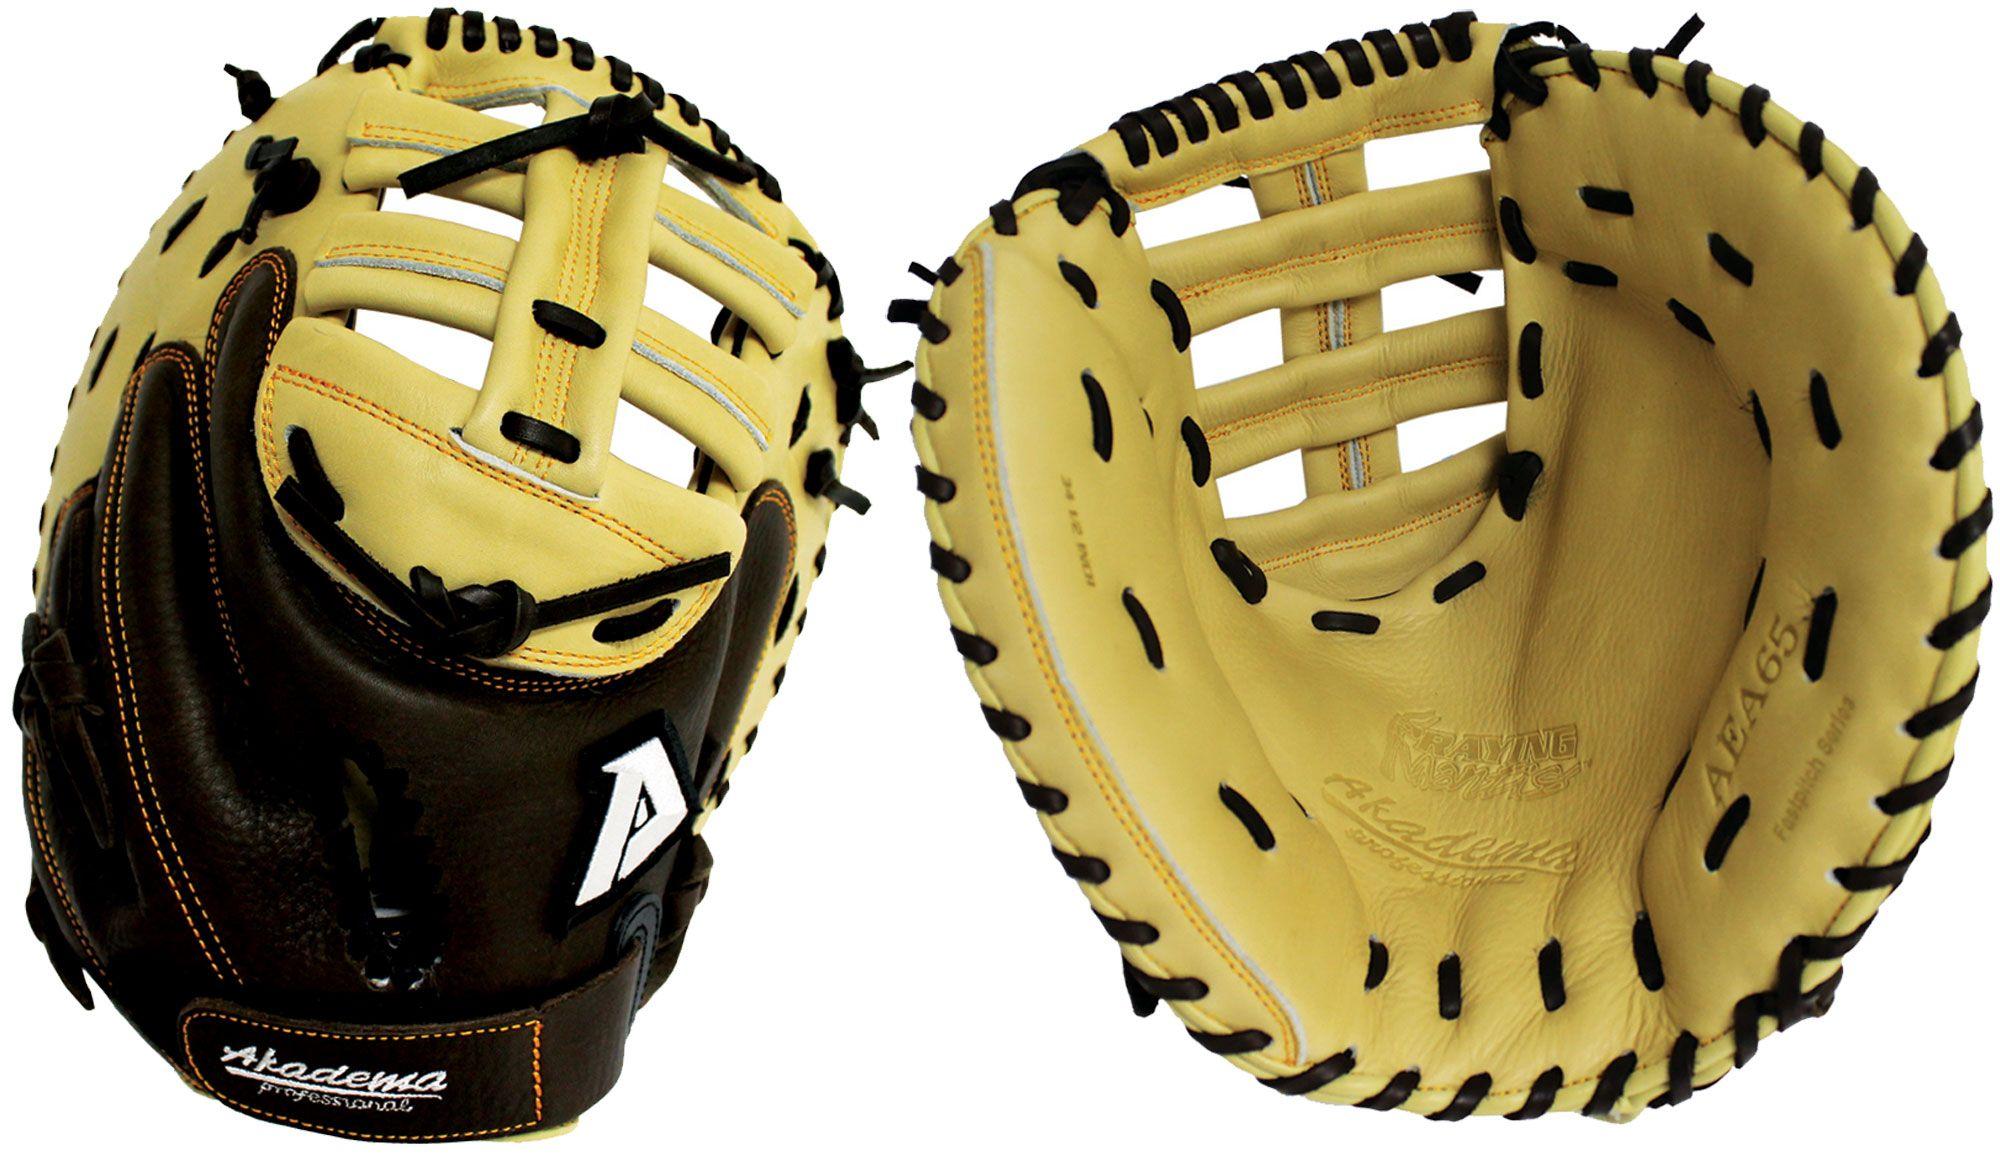 "Akadema 34"" Fastpitch Series Catcher's Mitt | DICK'S Sporting Goods"